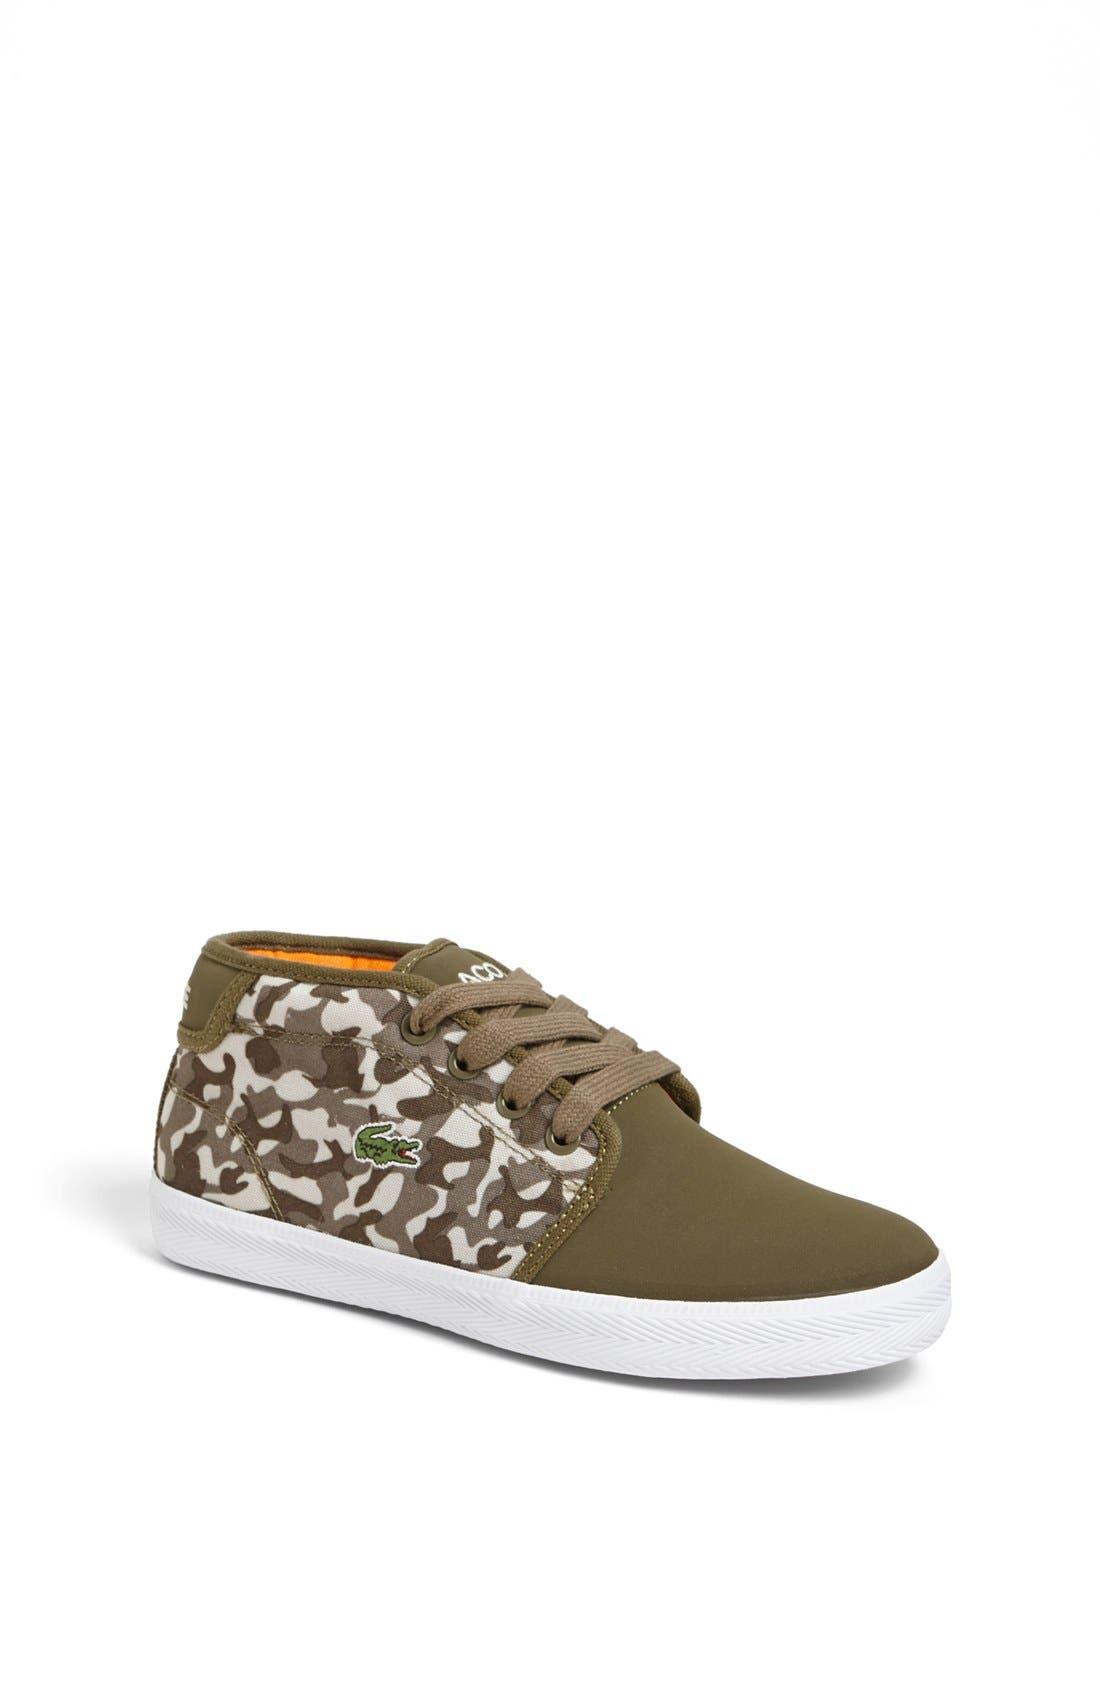 Main Image - Lacoste 'Ampthill' Sneaker (Baby, Walker, Toddler, Little Kid & Big Kid)